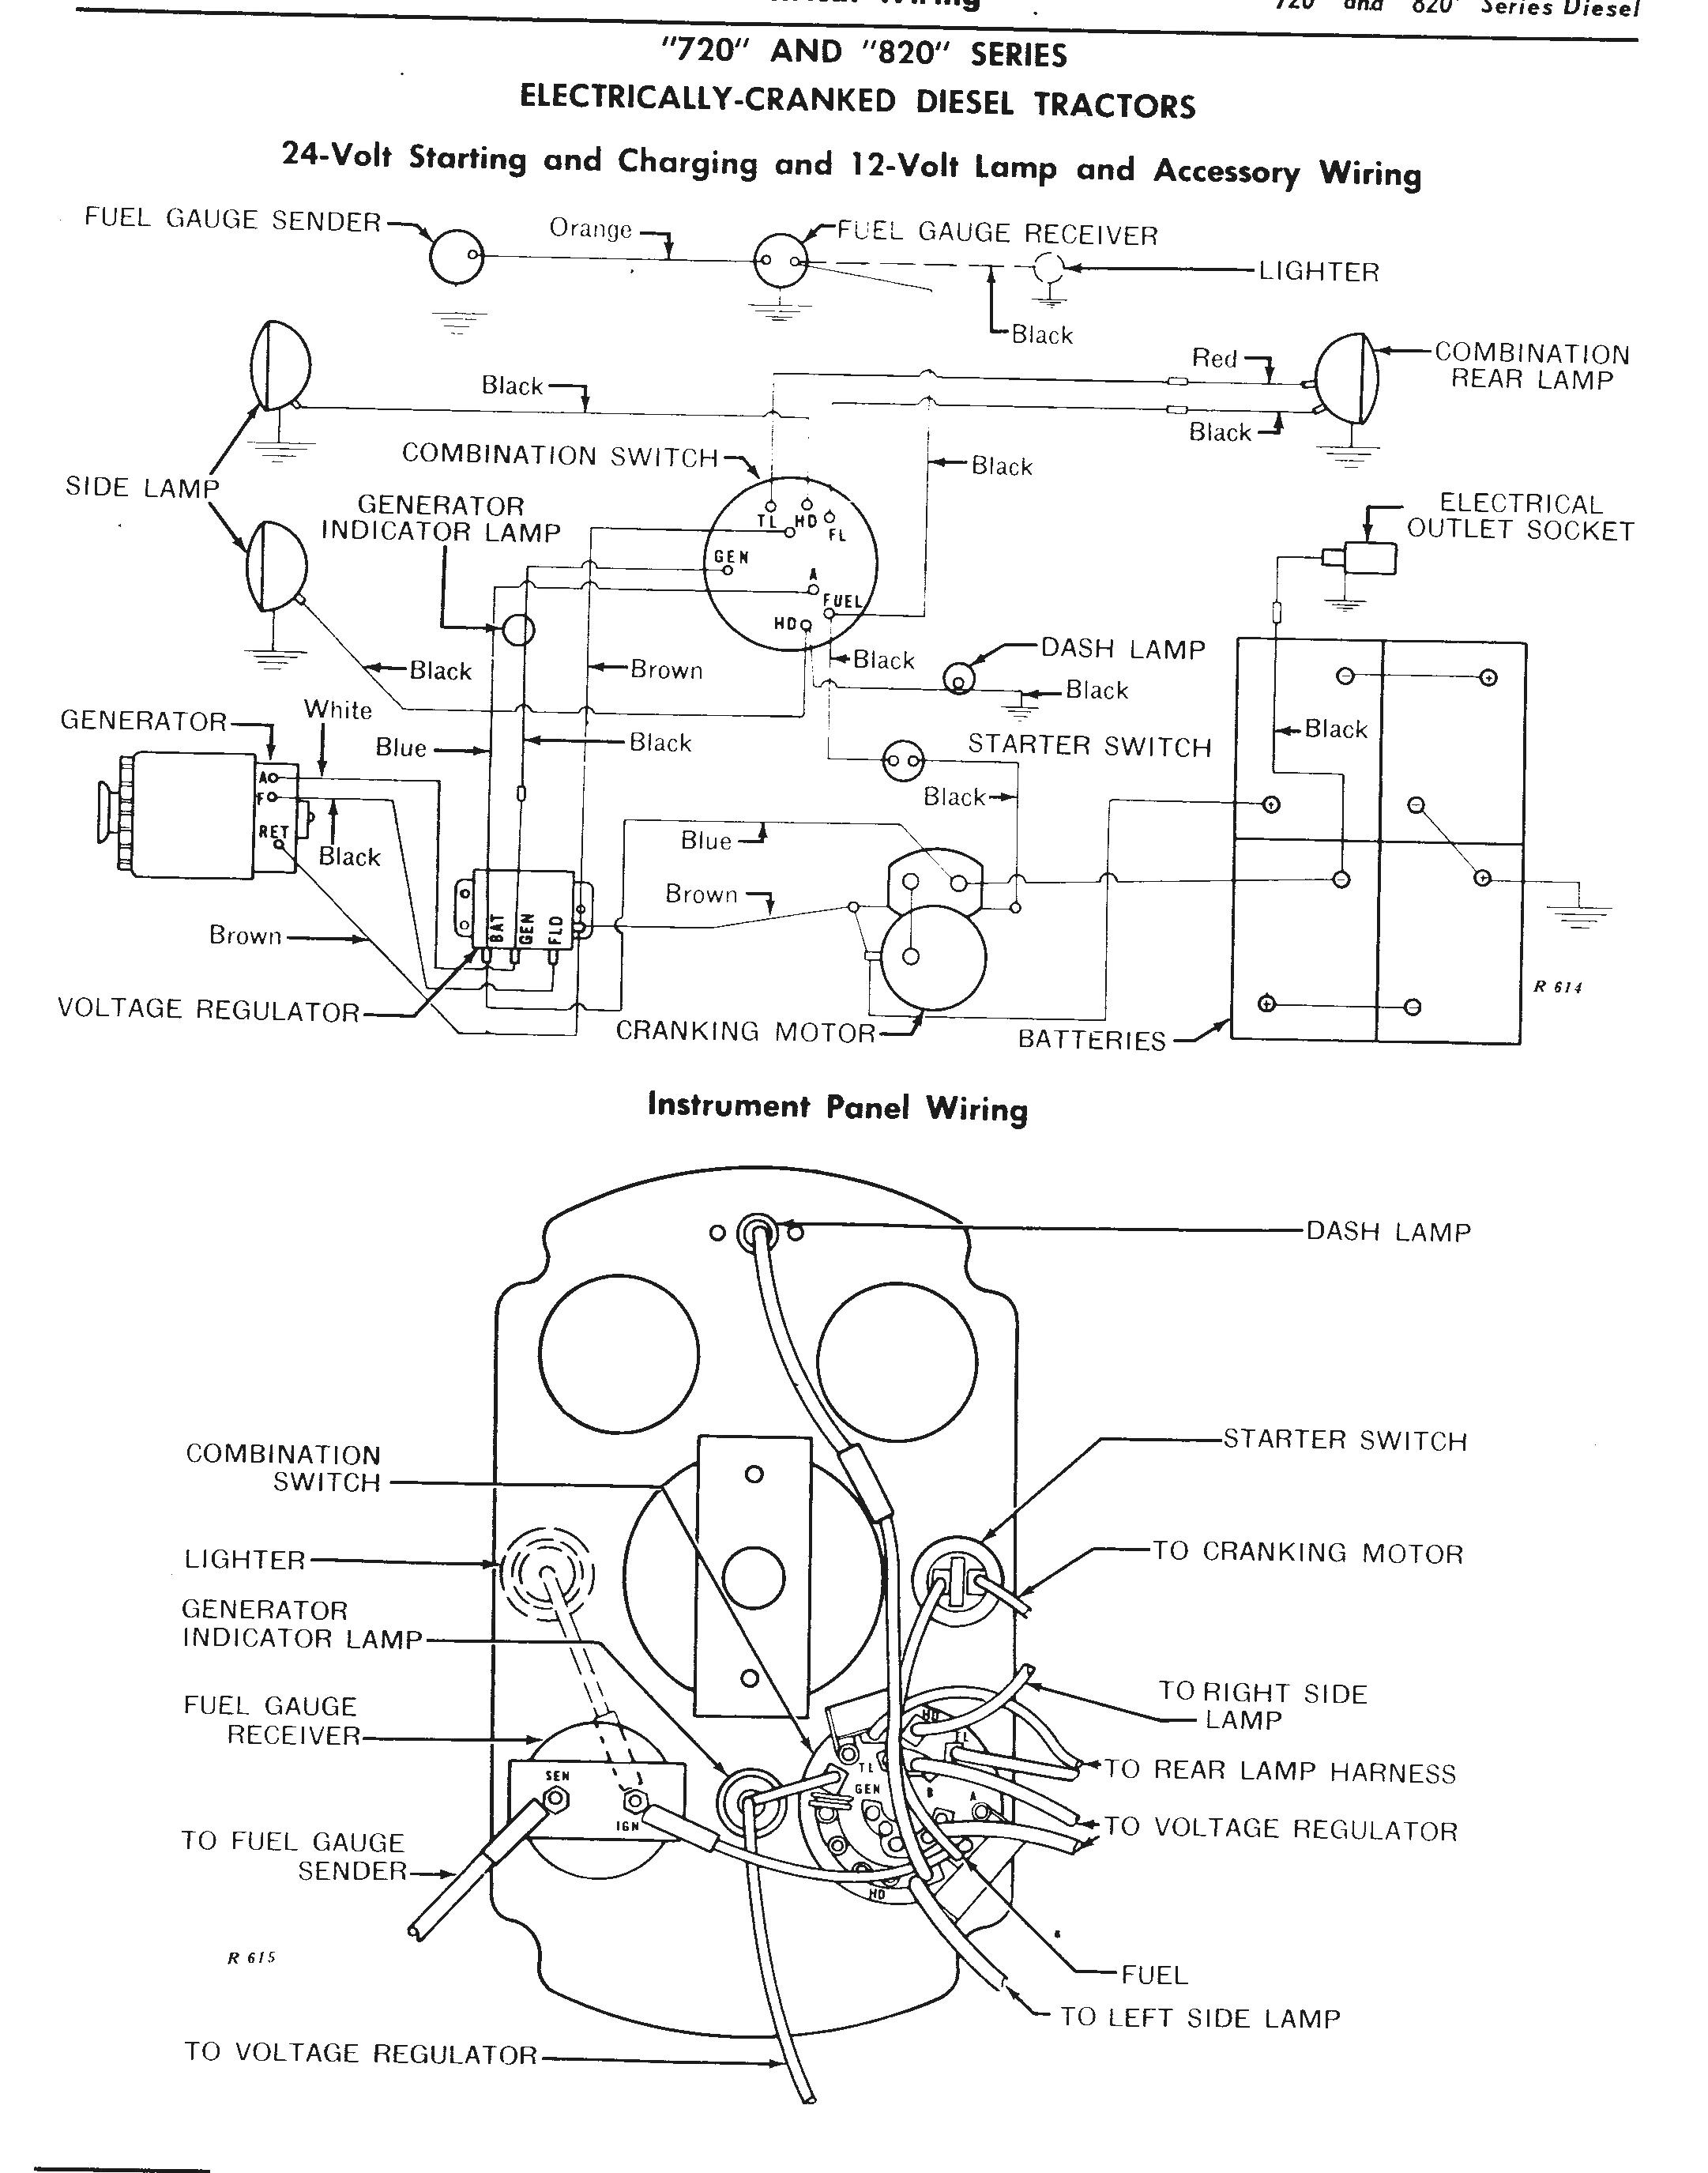 John Deere 310e Wiring Diagram Simple Massey Harris 310 Circuit Schematic Troubleshooting 310a Backhoe